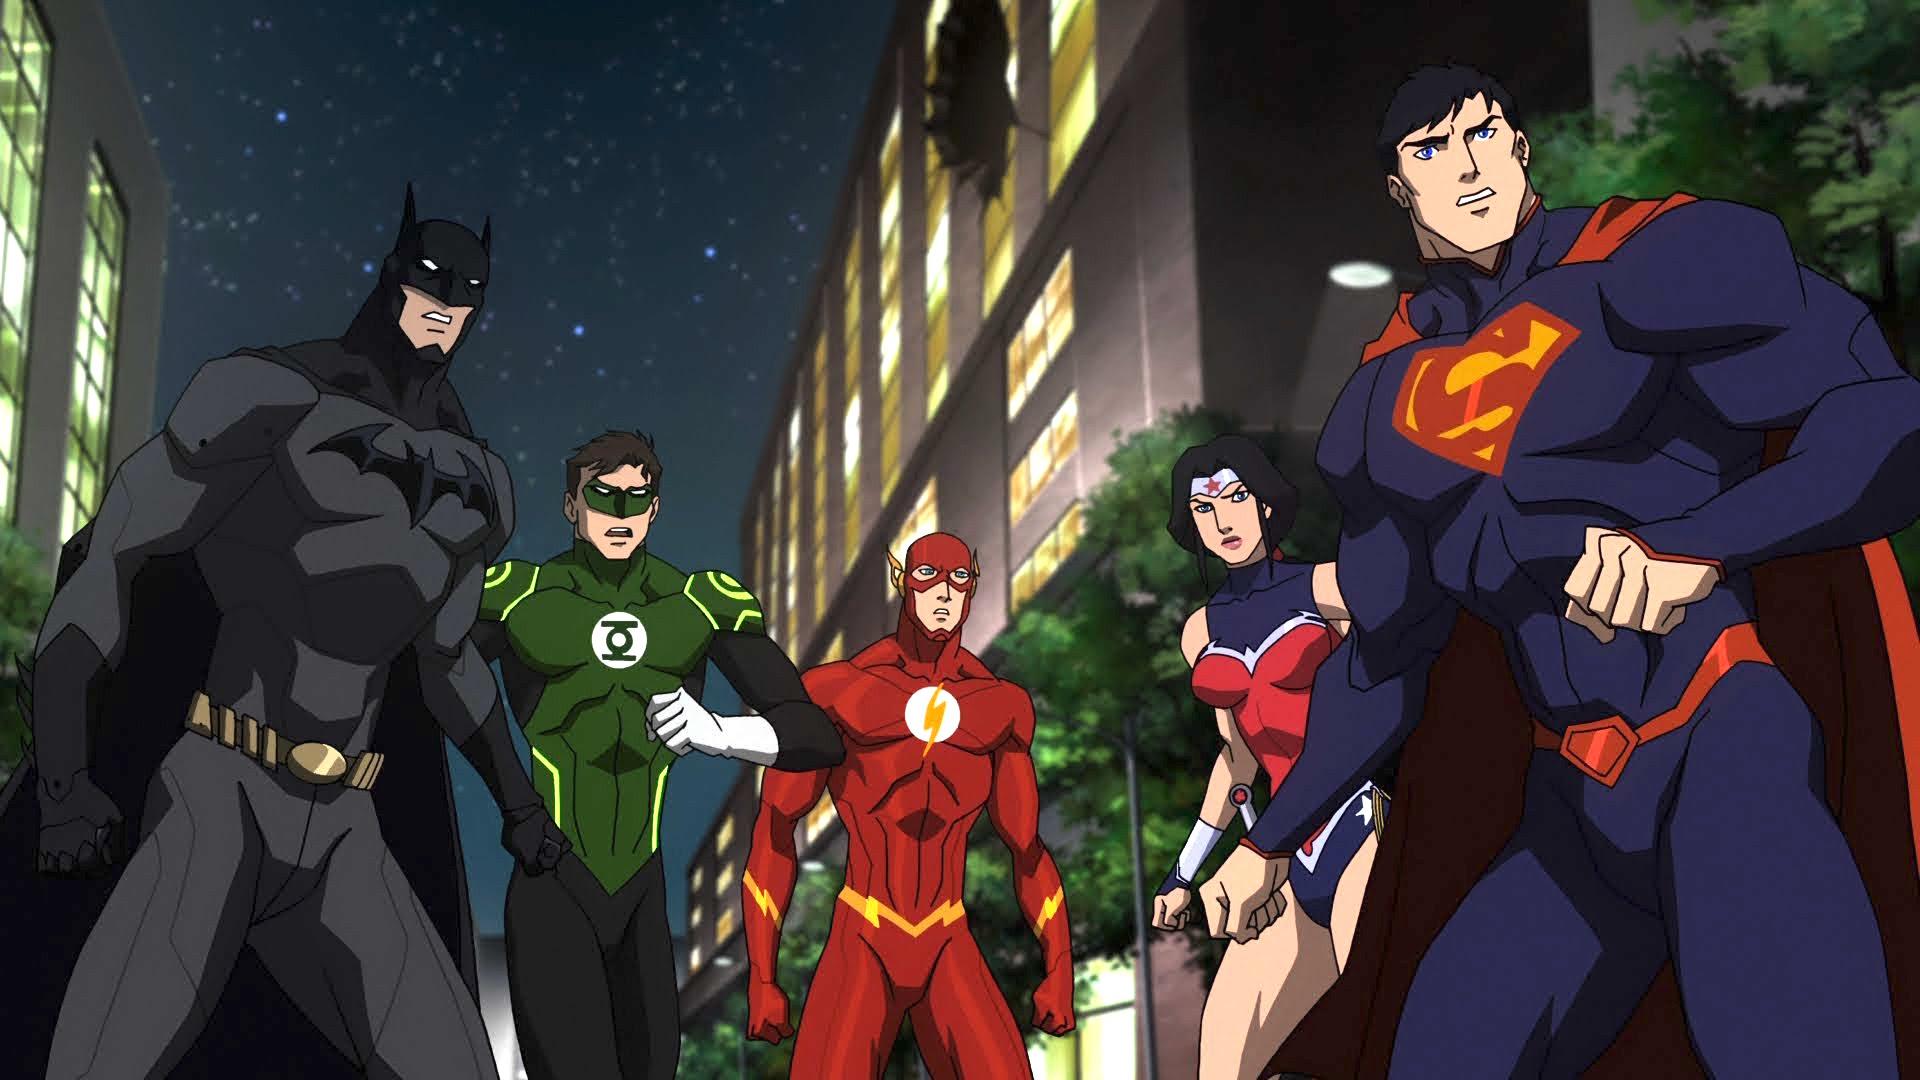 Justice League: War - Complete Fatality List